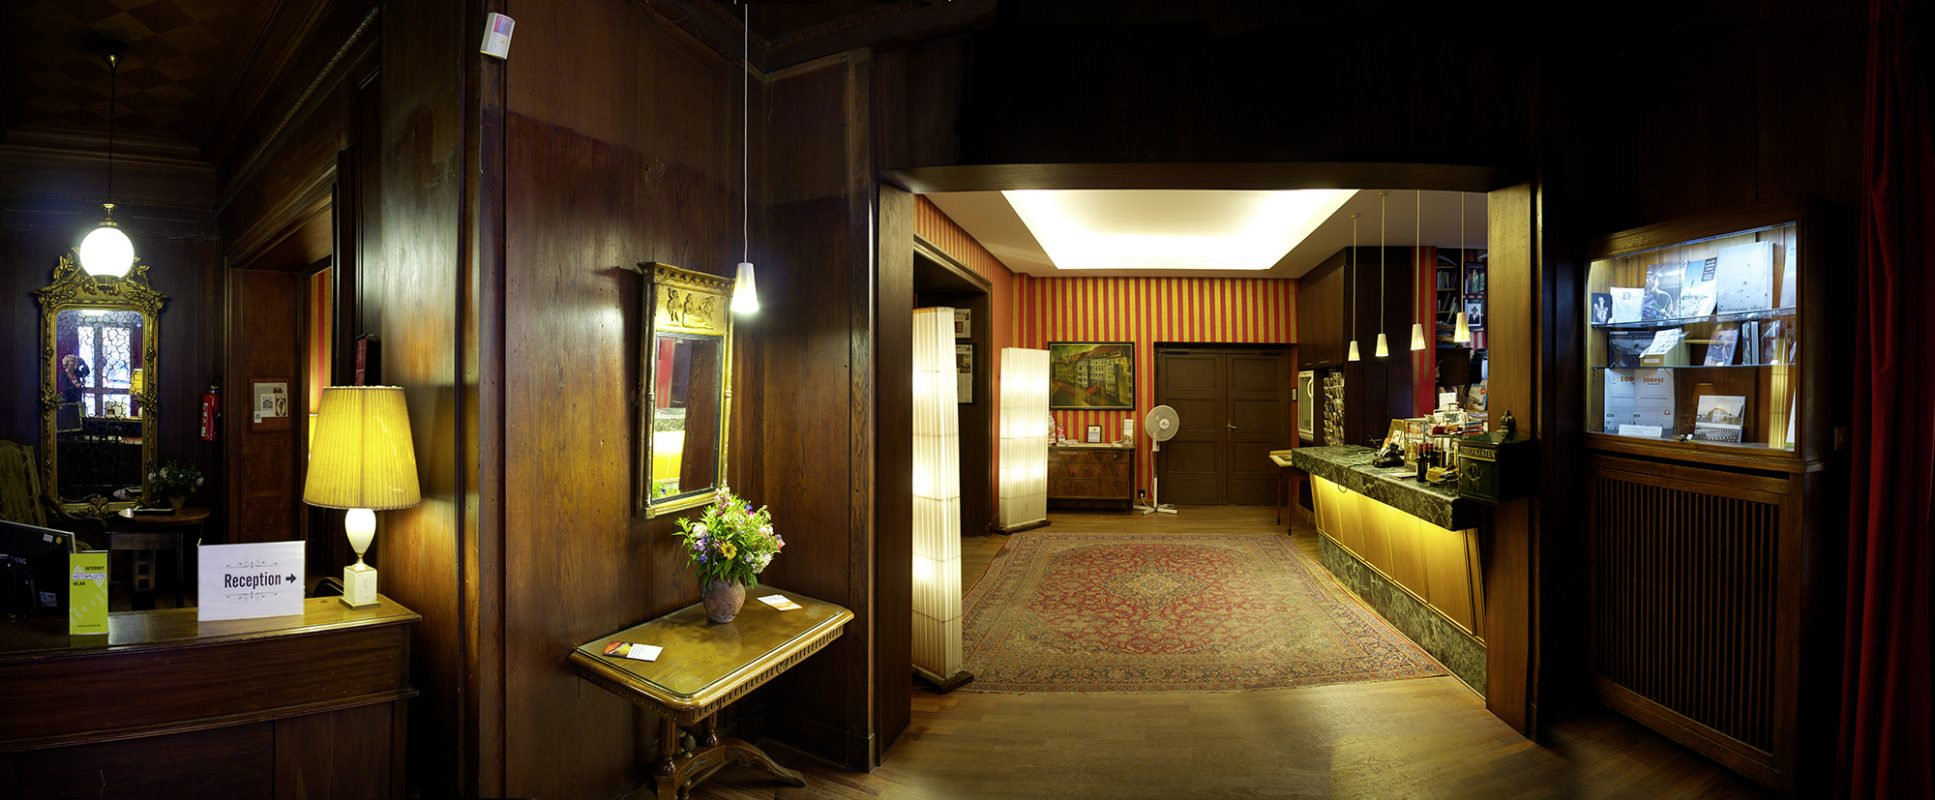 Hotel Bogota Entree